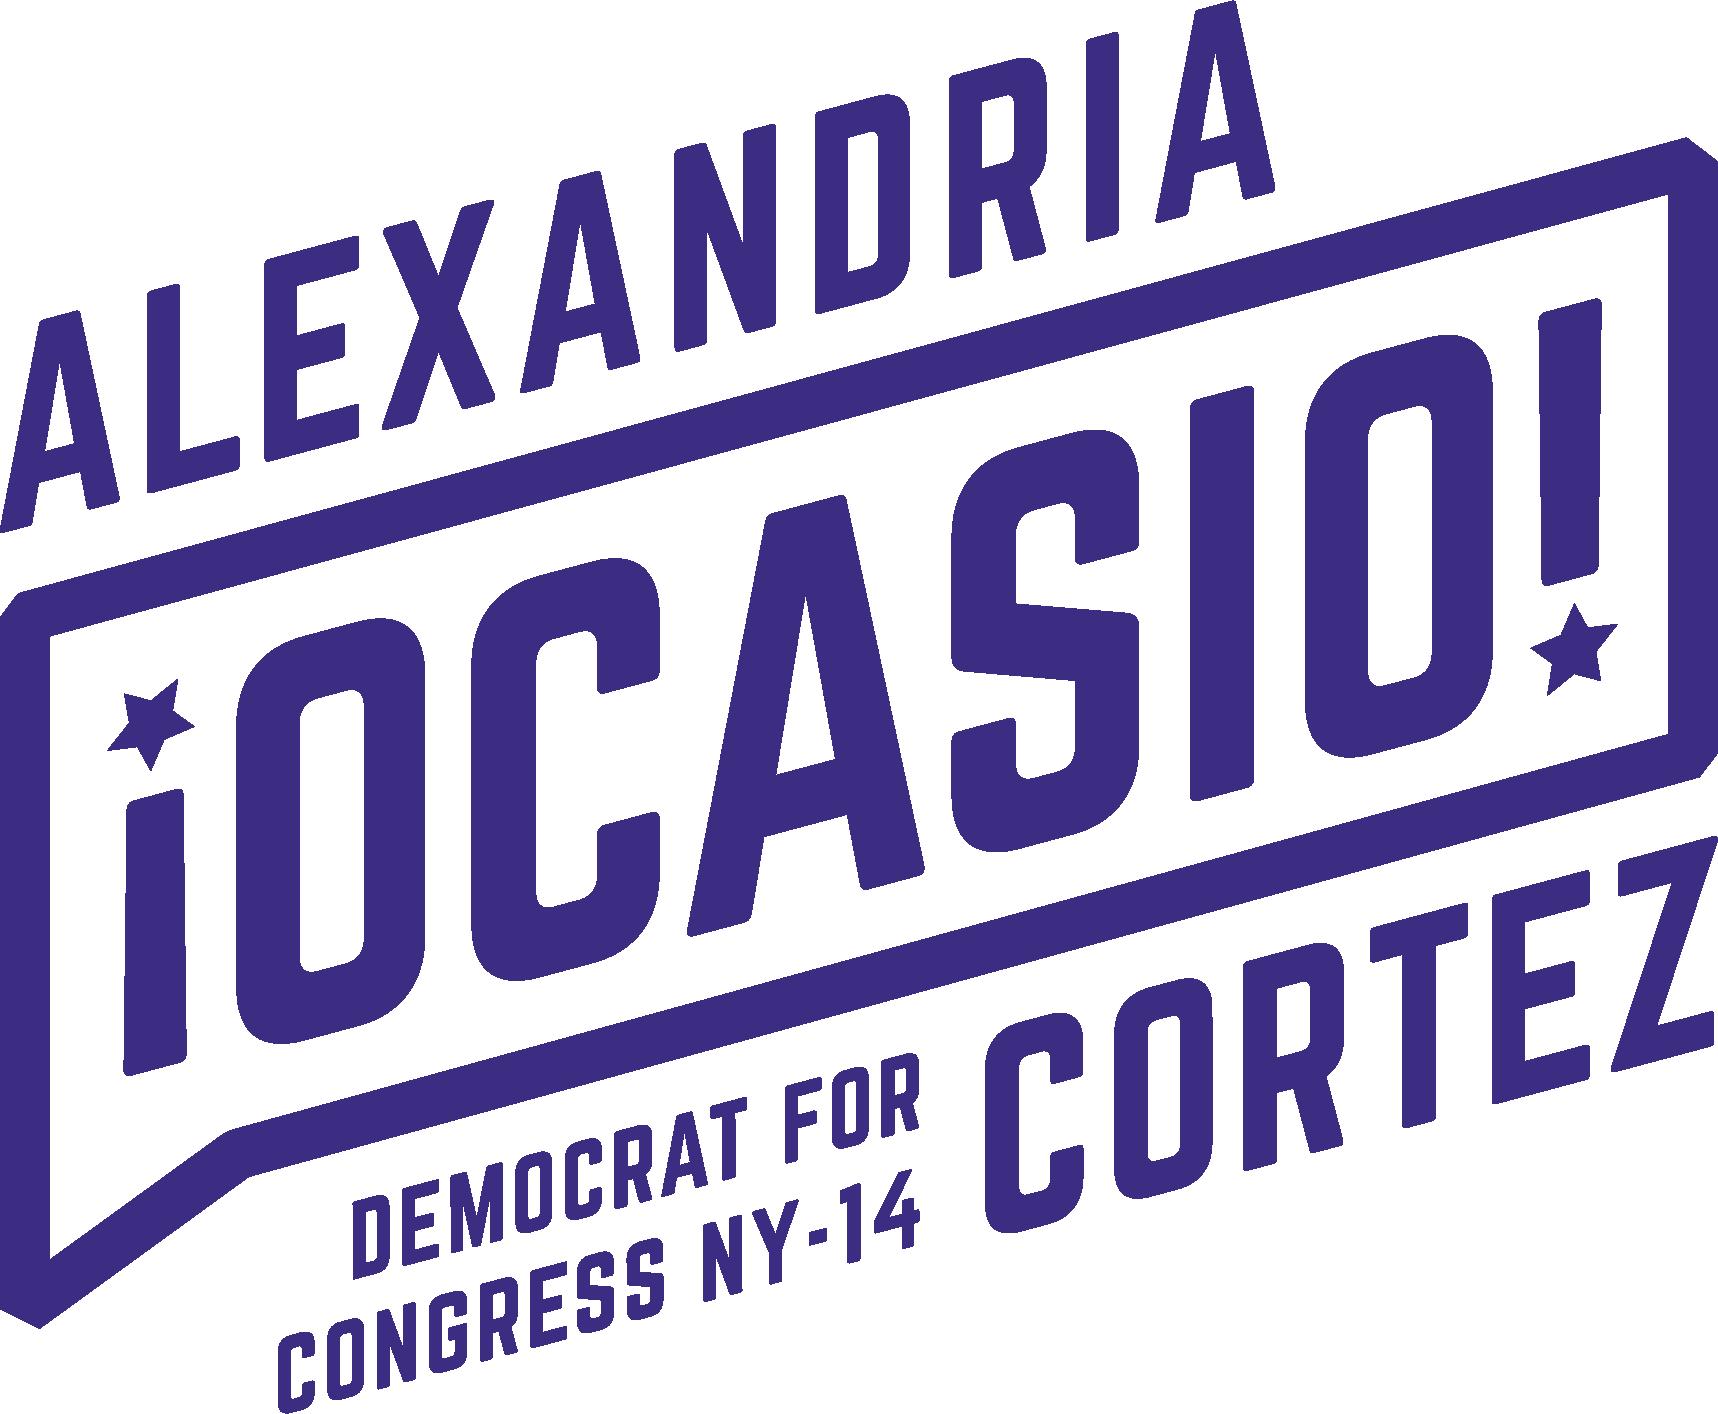 Alexandria Ocasio-Cortez for Congress